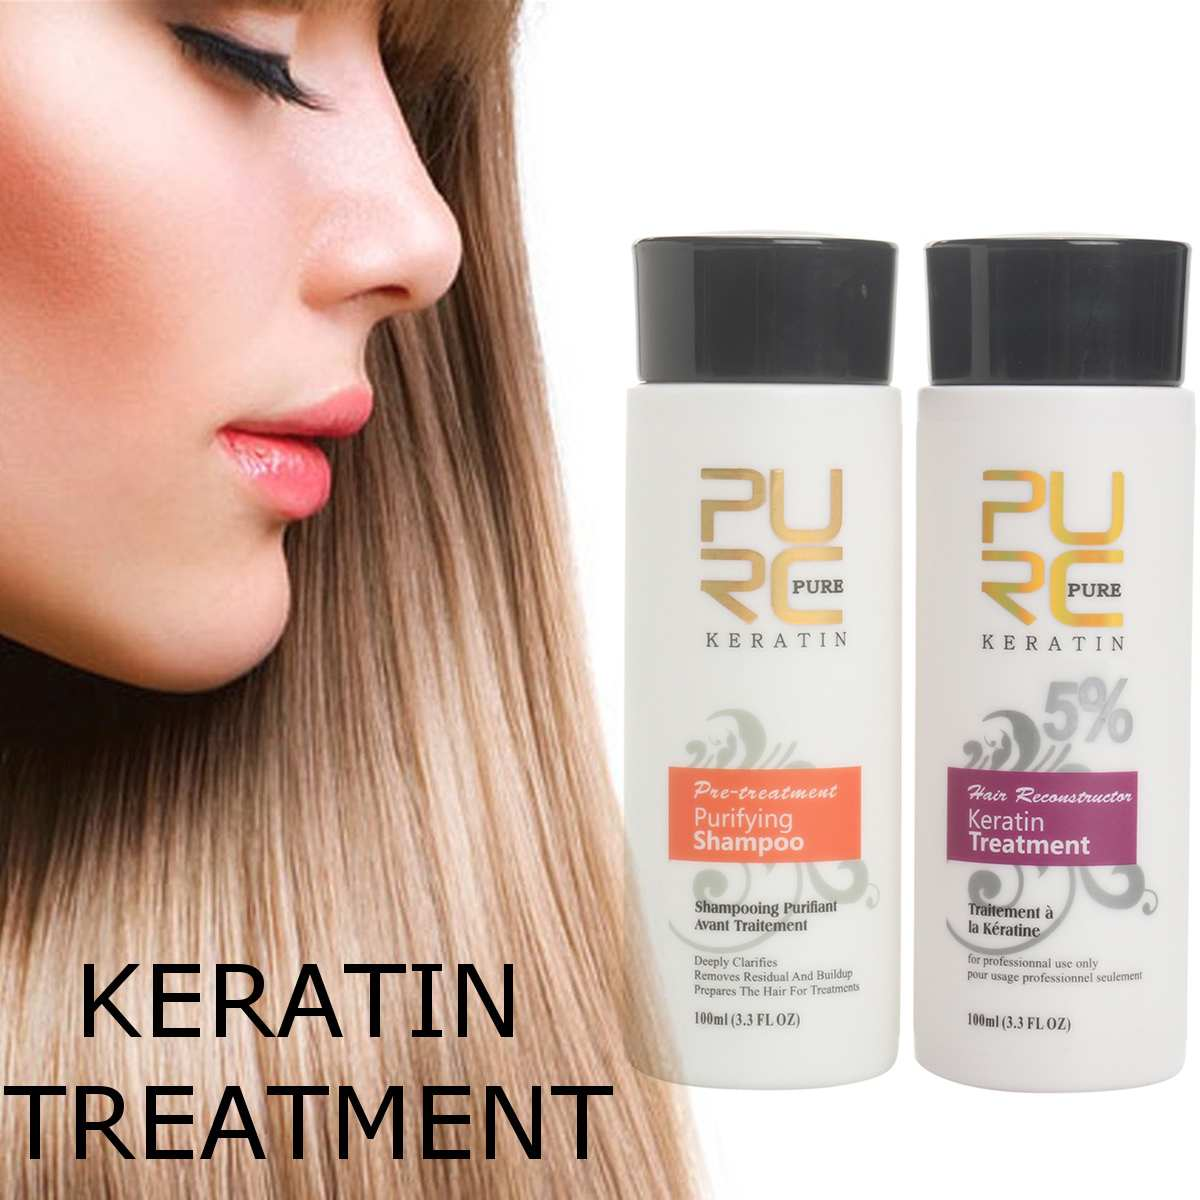 PURC Brazilian keratin hair straighten 100ml x 2 hair care product for Repair damaged hair & straighten hair care keratin